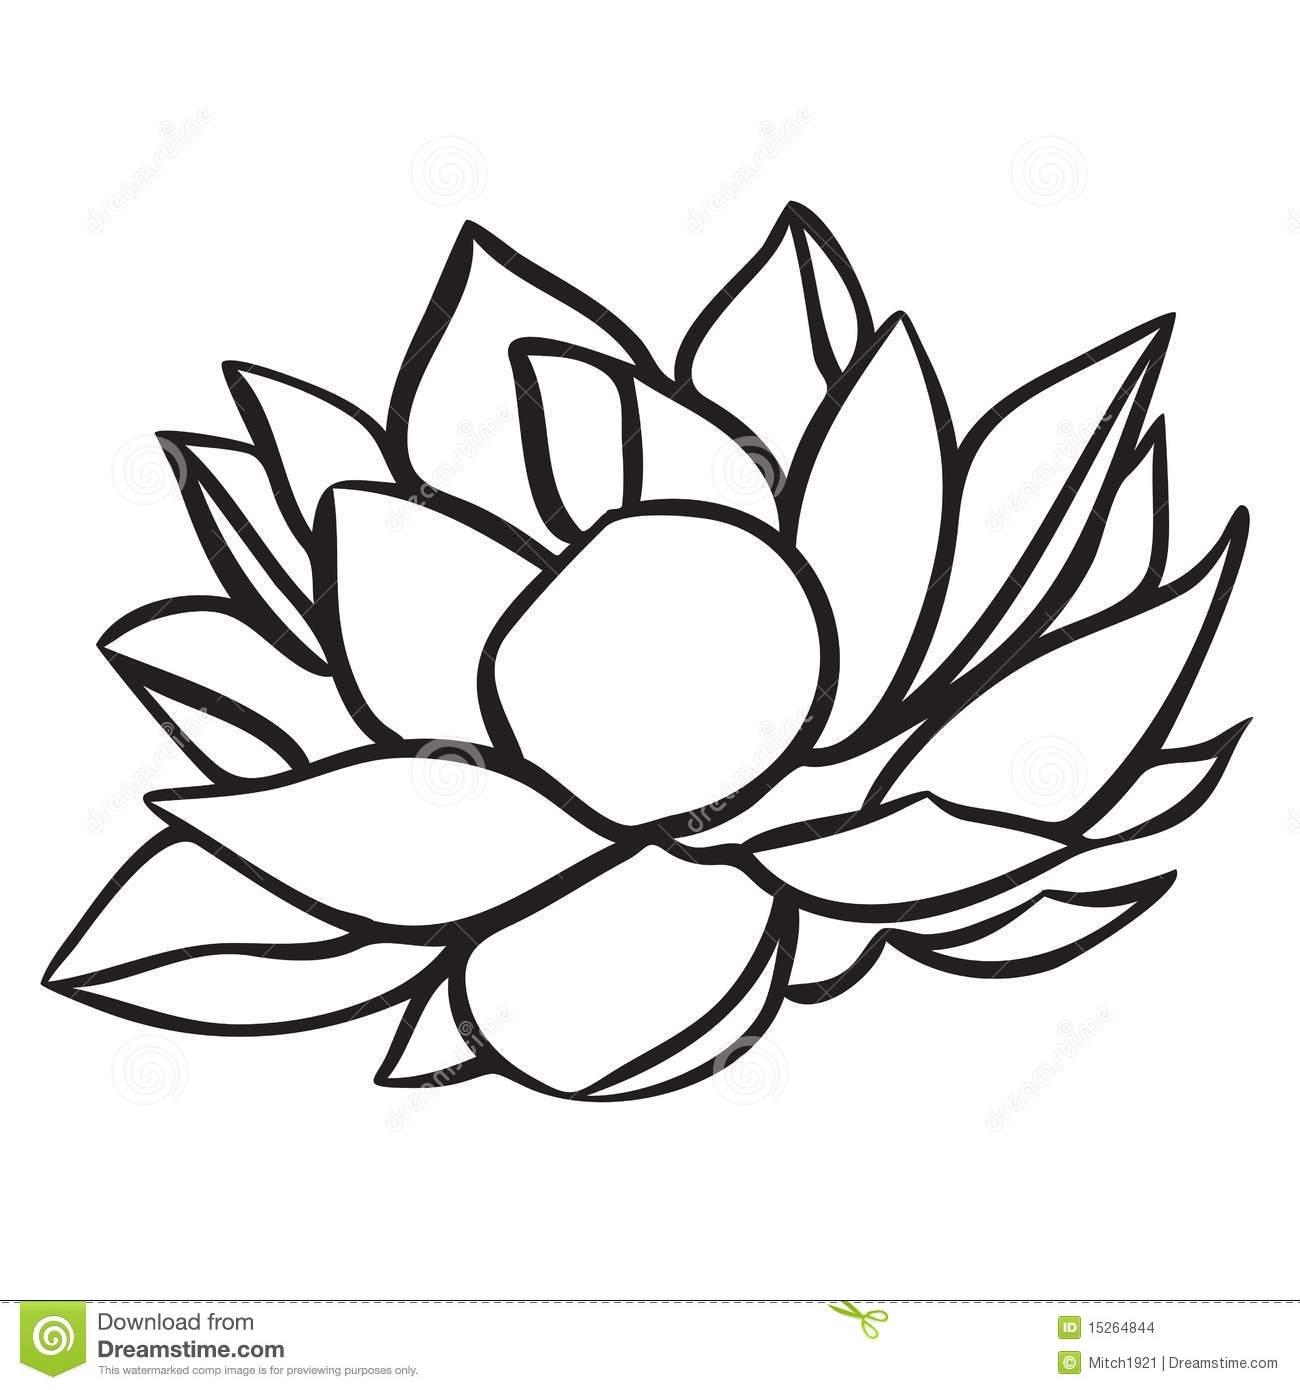 Drawn lotus White and Lotus Gallery Black